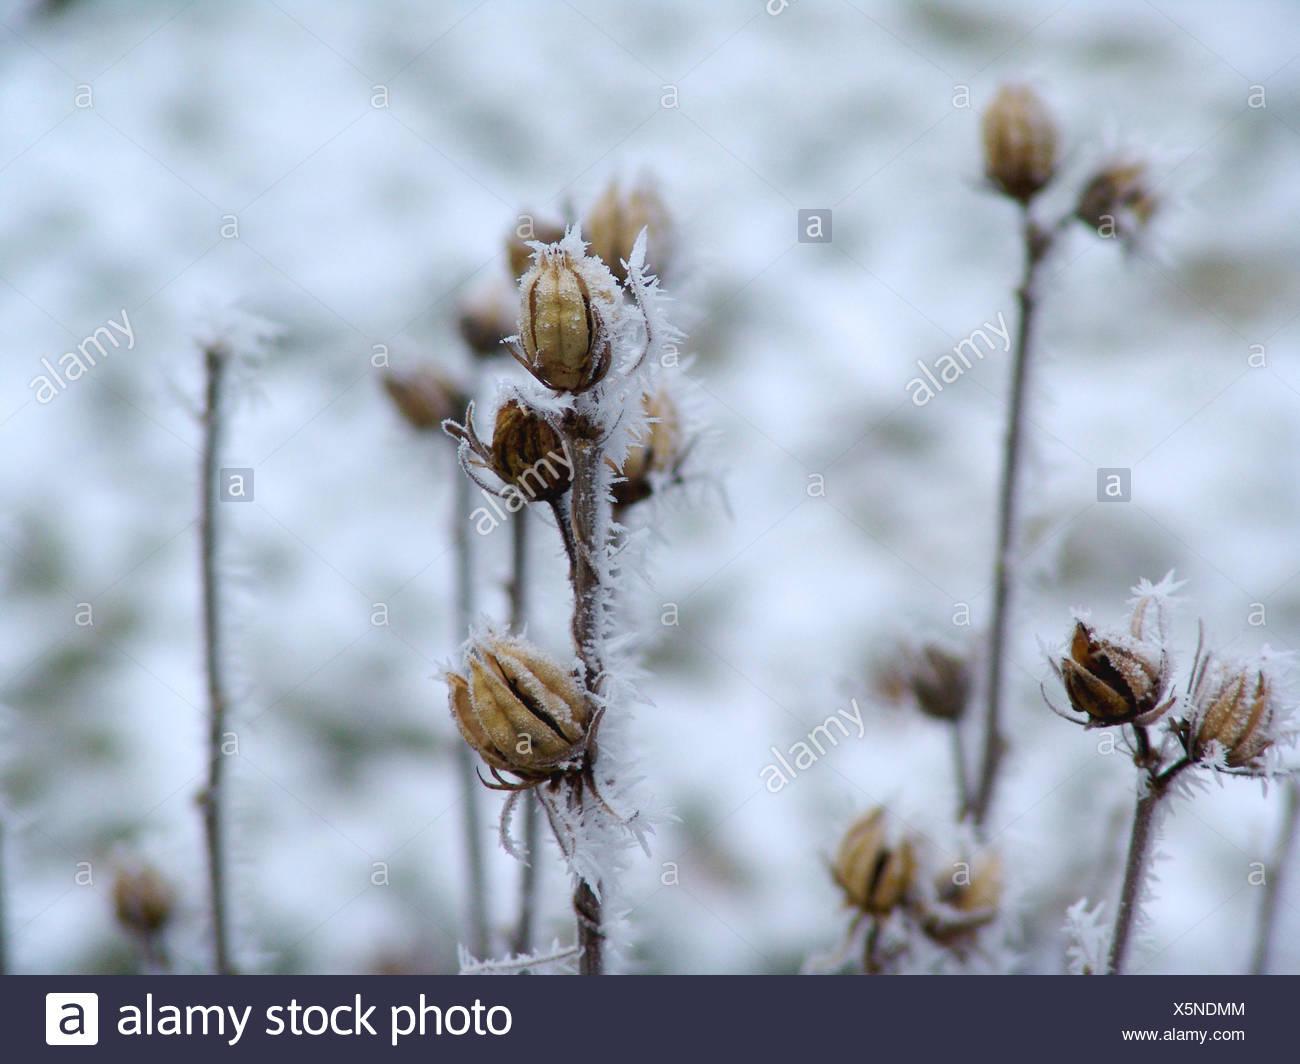 Hibiscus In Winter Stock Photo 278910932 Alamy